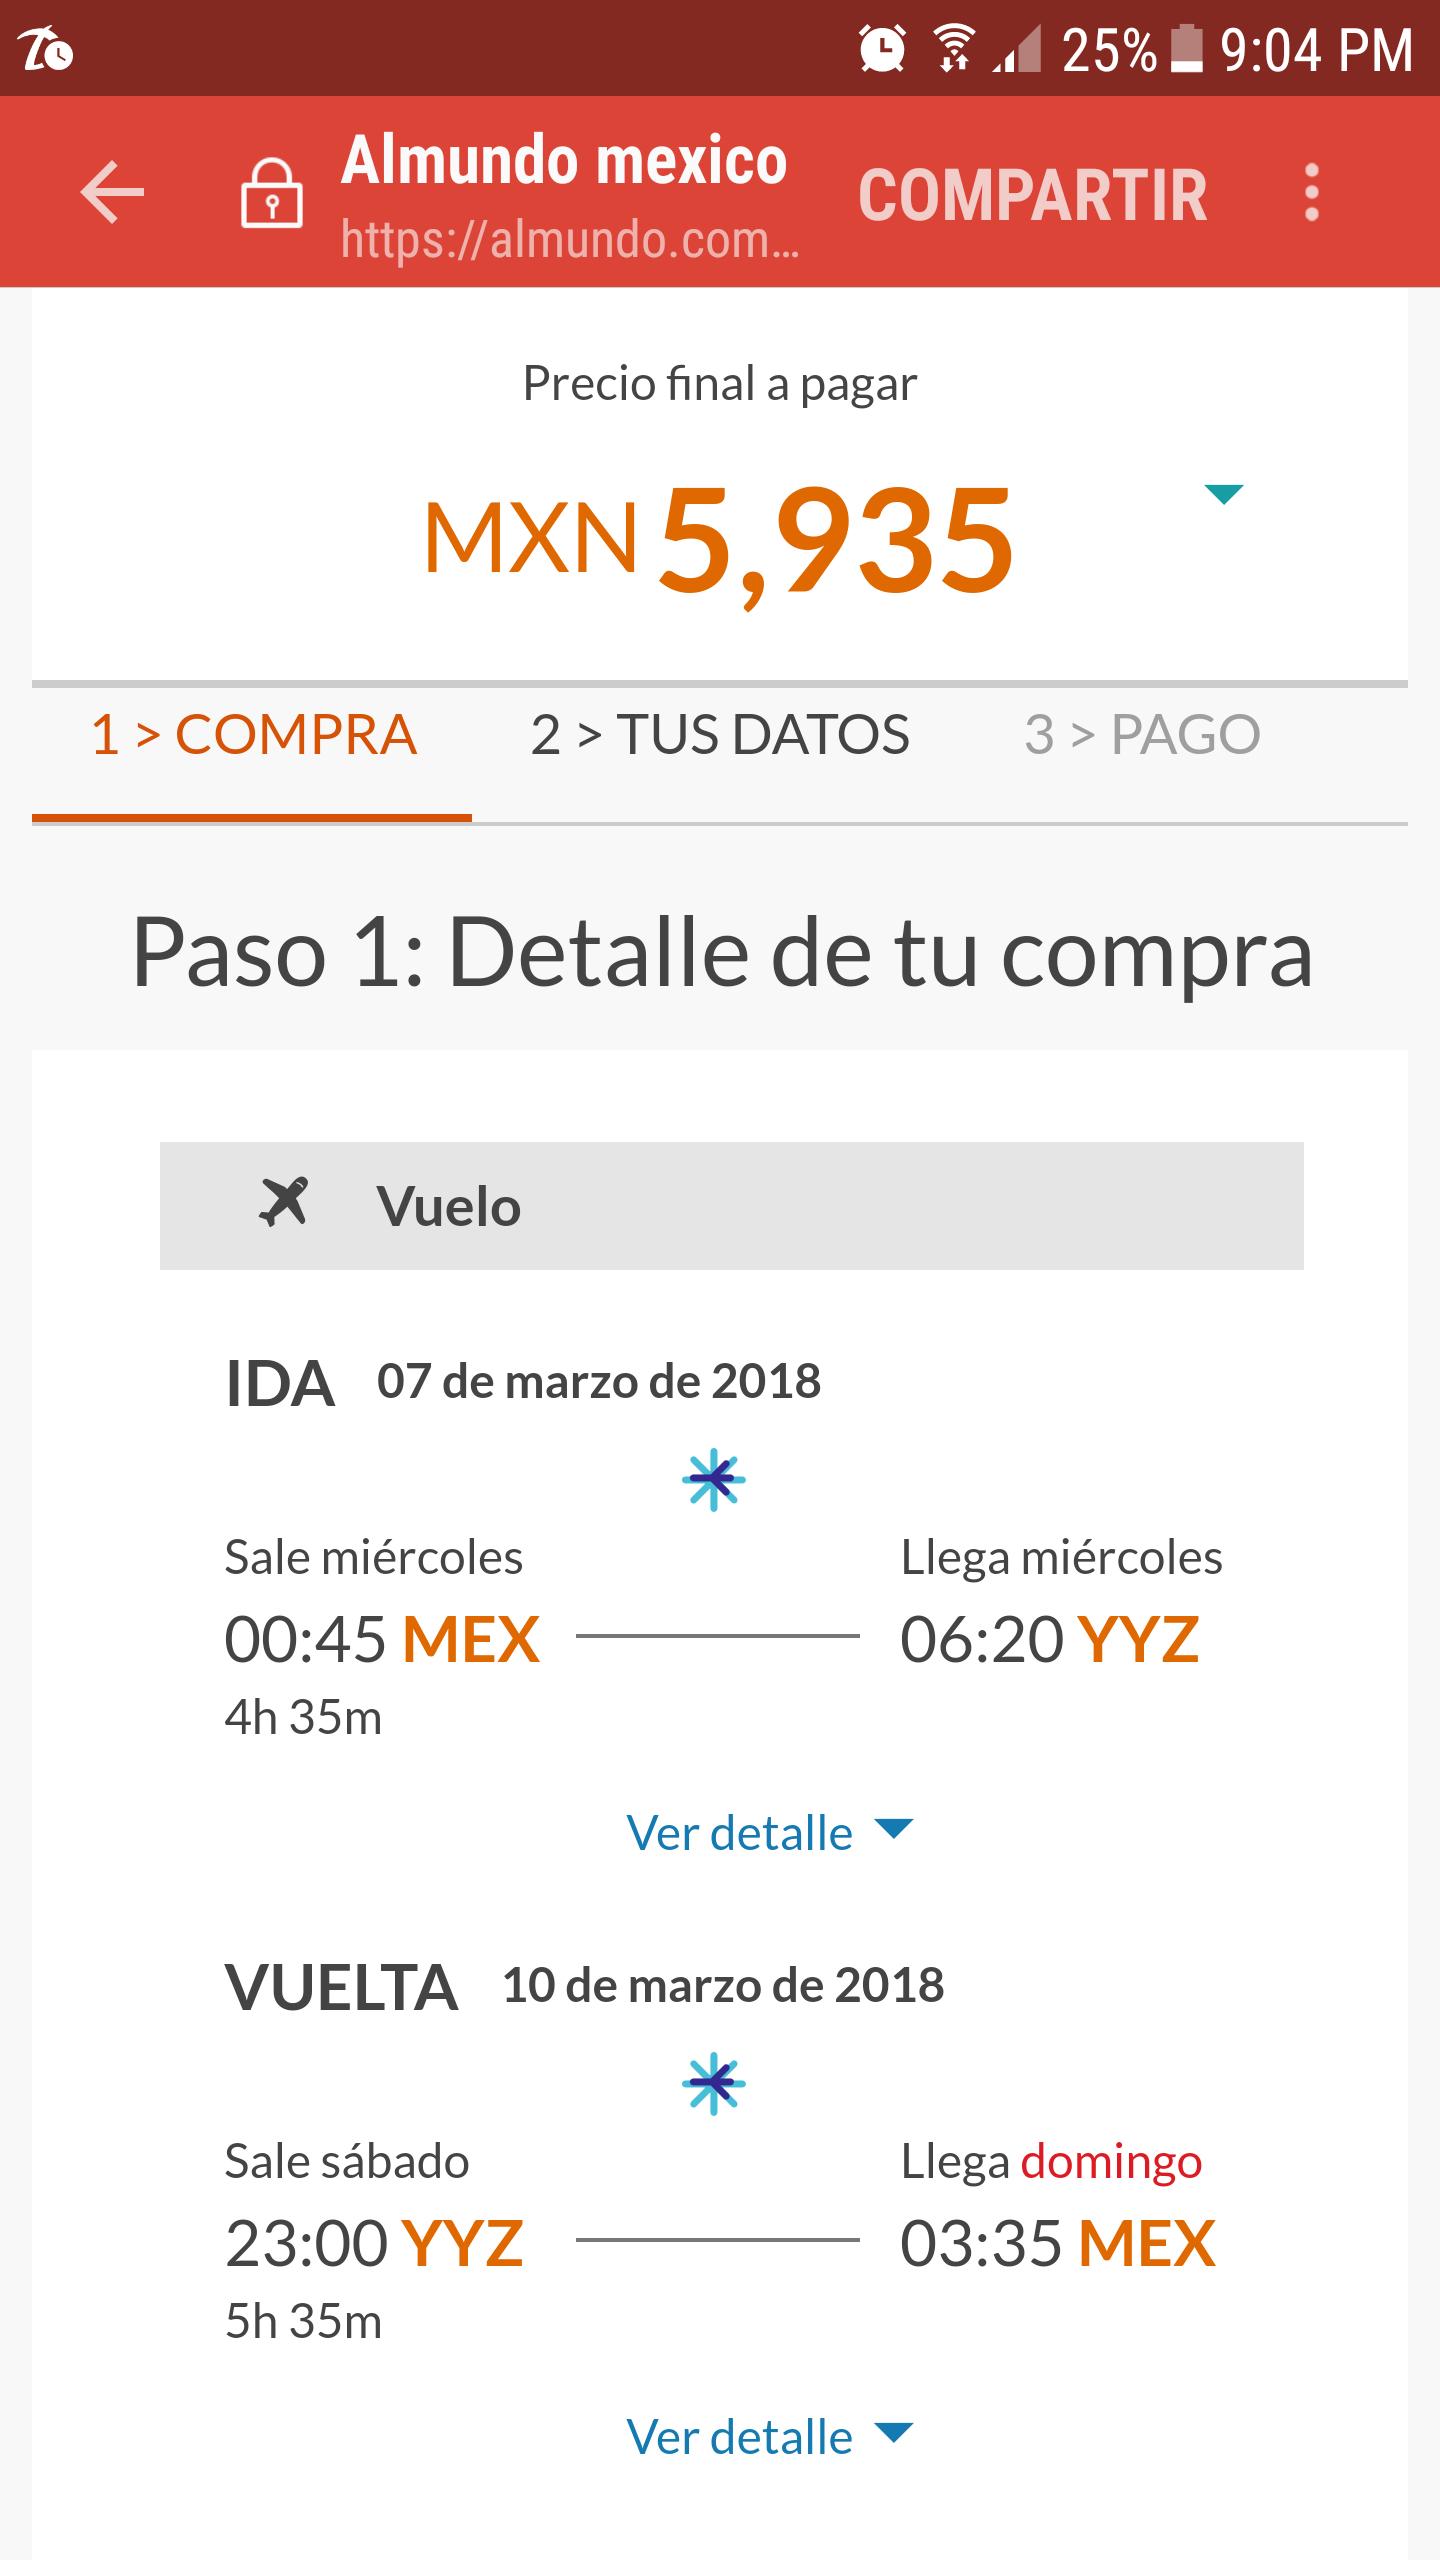 Almundo.com: vuelo redondo Mexico-Toronto Canadá